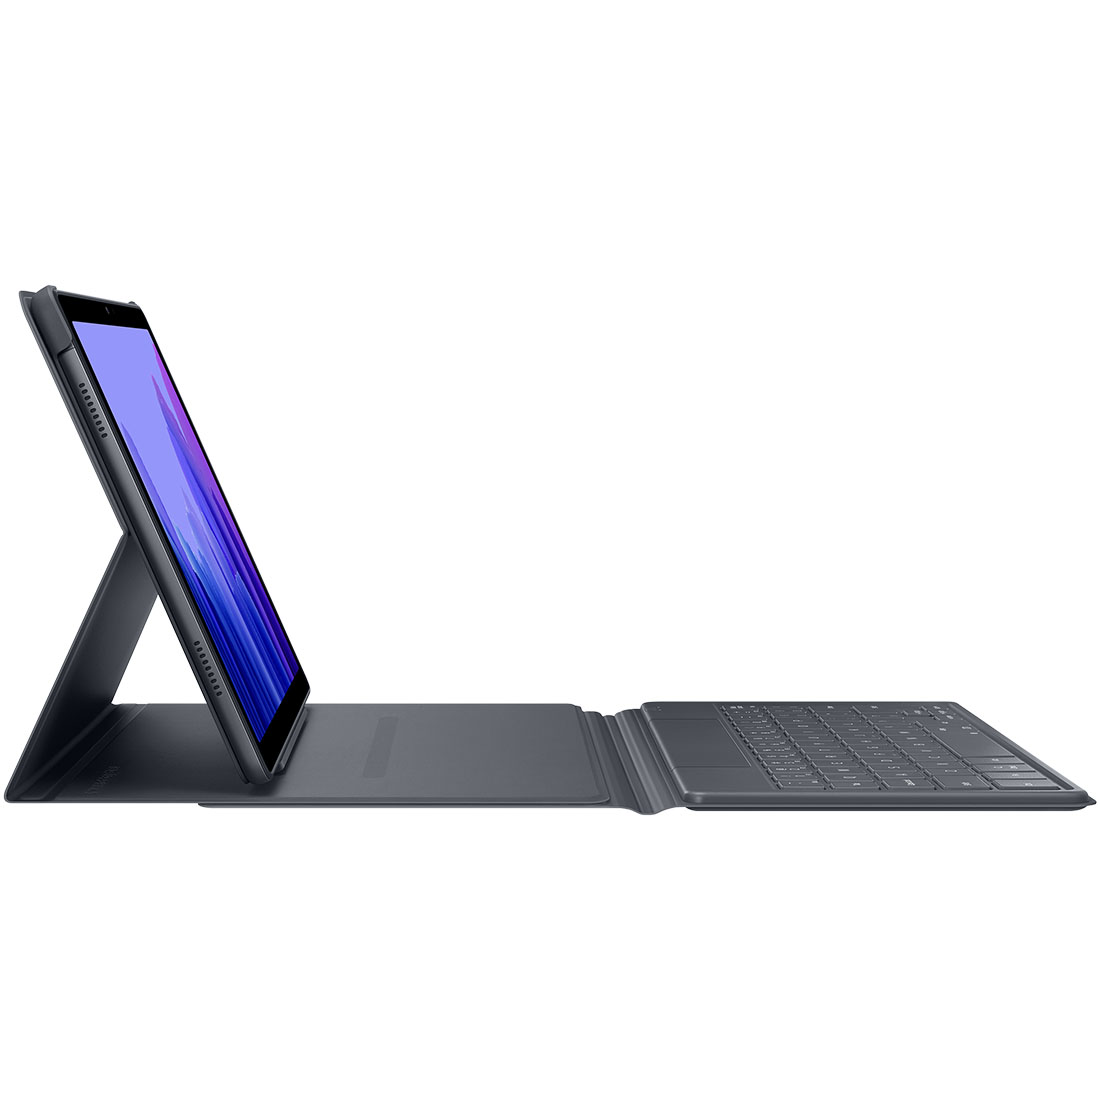 "Capa Teclado Original Samsung Tab A7 10.4"" SM-T500 e T505"